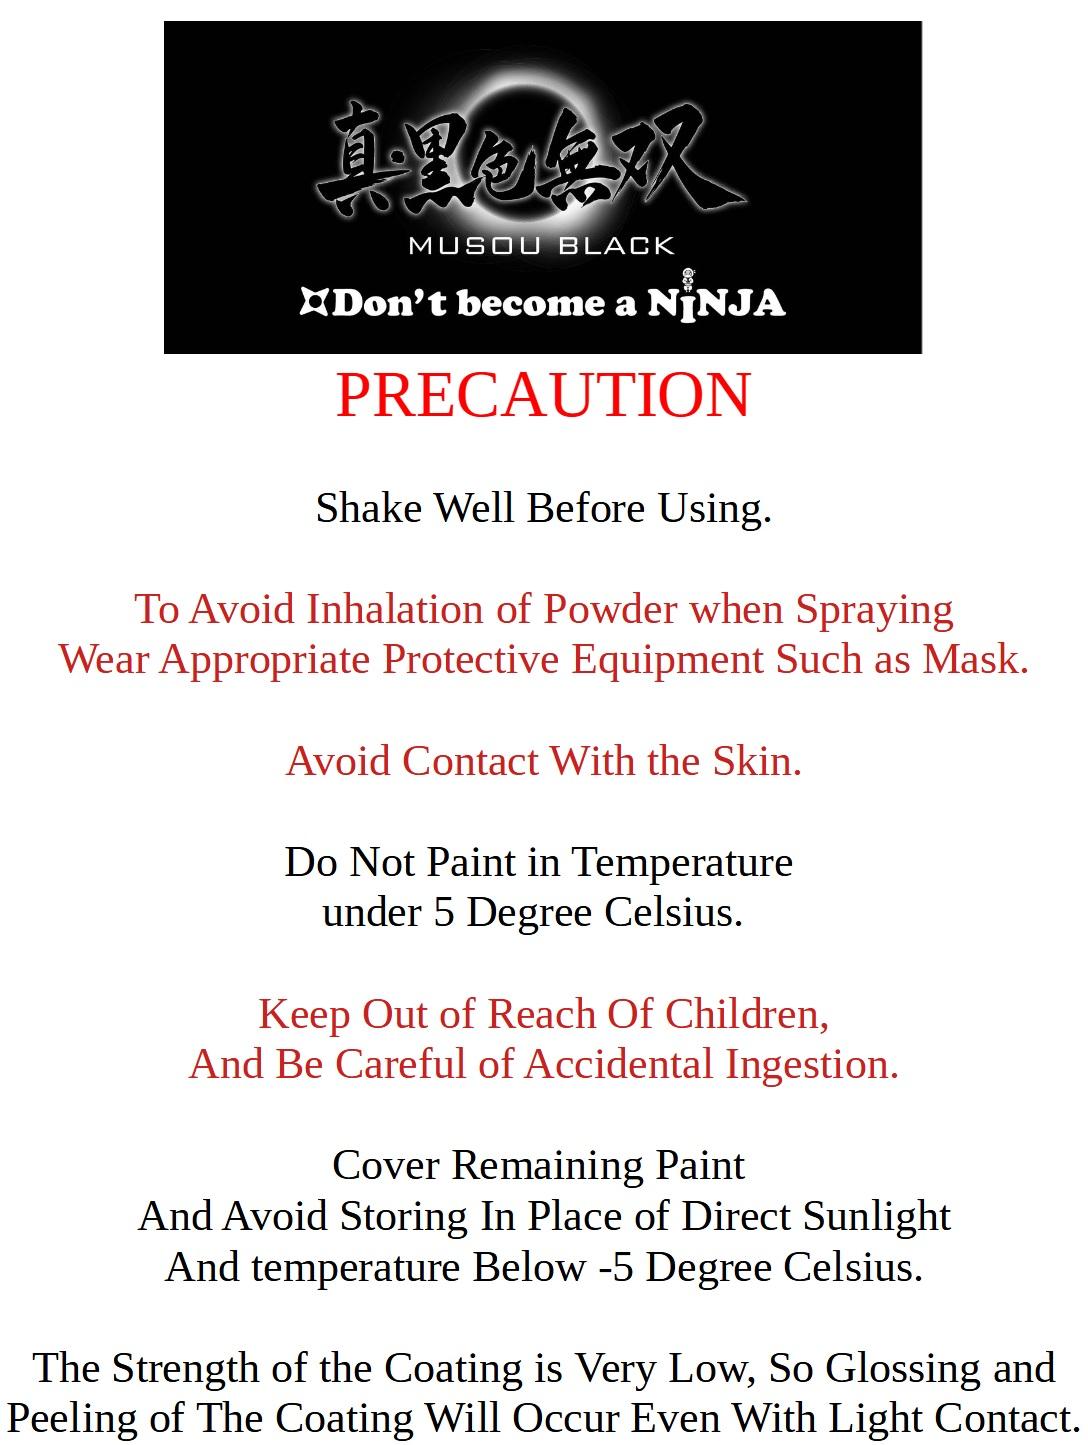 Precaution text EN